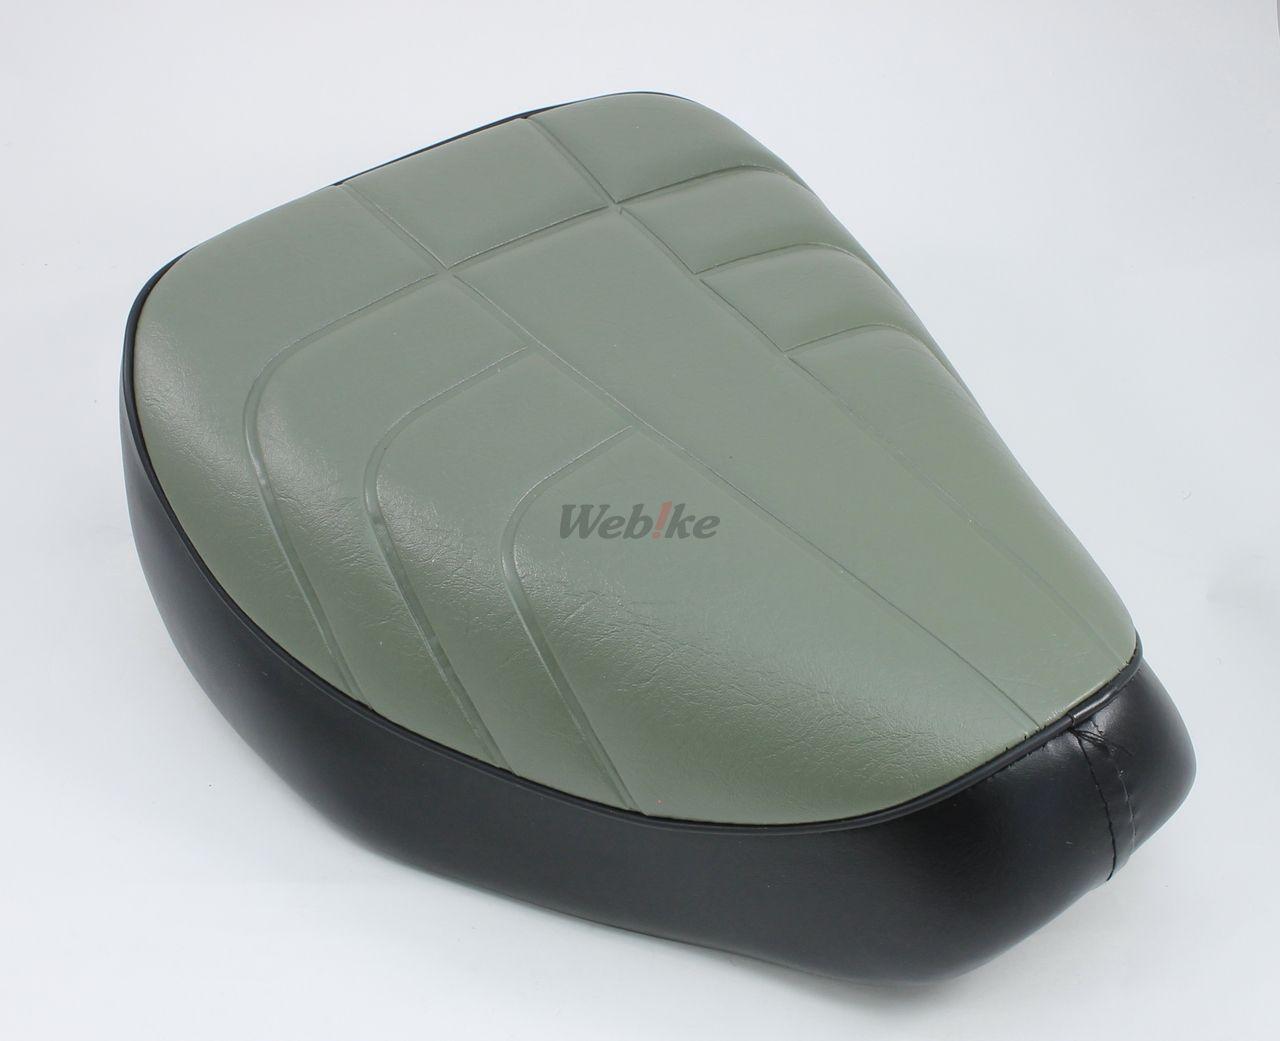 【MADMAX】Super Cub 用座墊 總成 - 「Webike-摩托百貨」